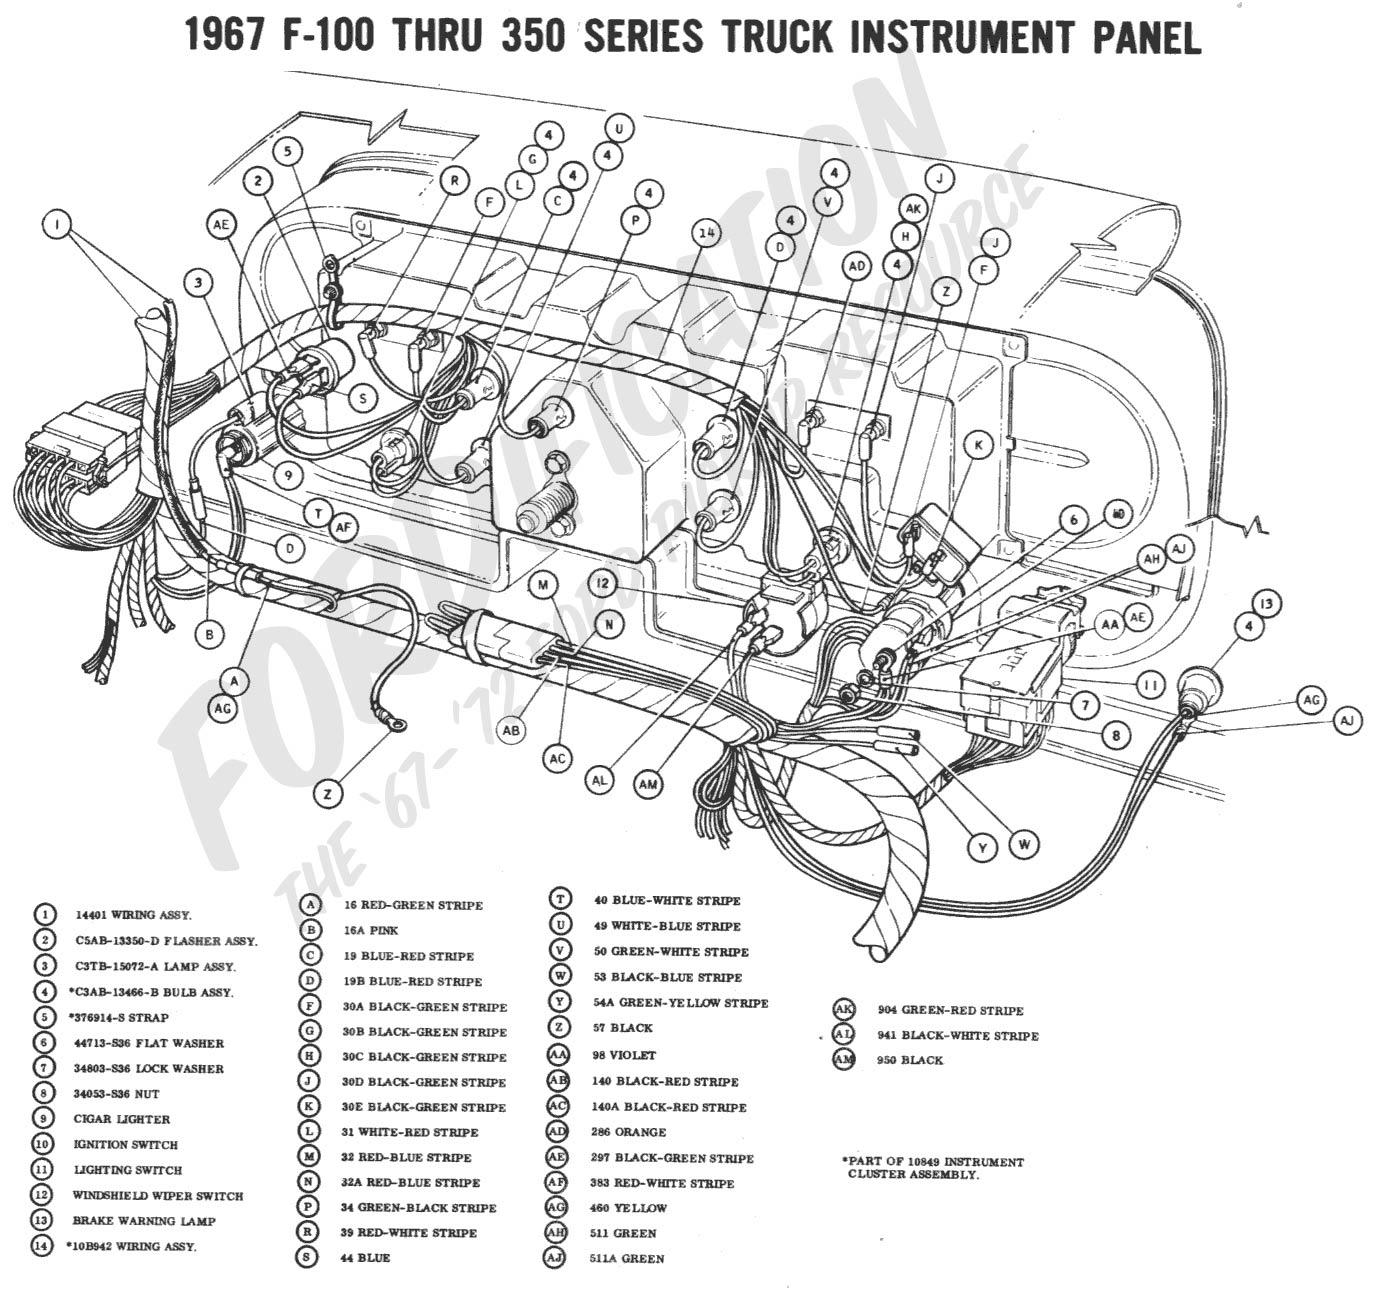 1967 ford wiring diagram 1967 ford truck wiring diagram  u2022 138dhw co